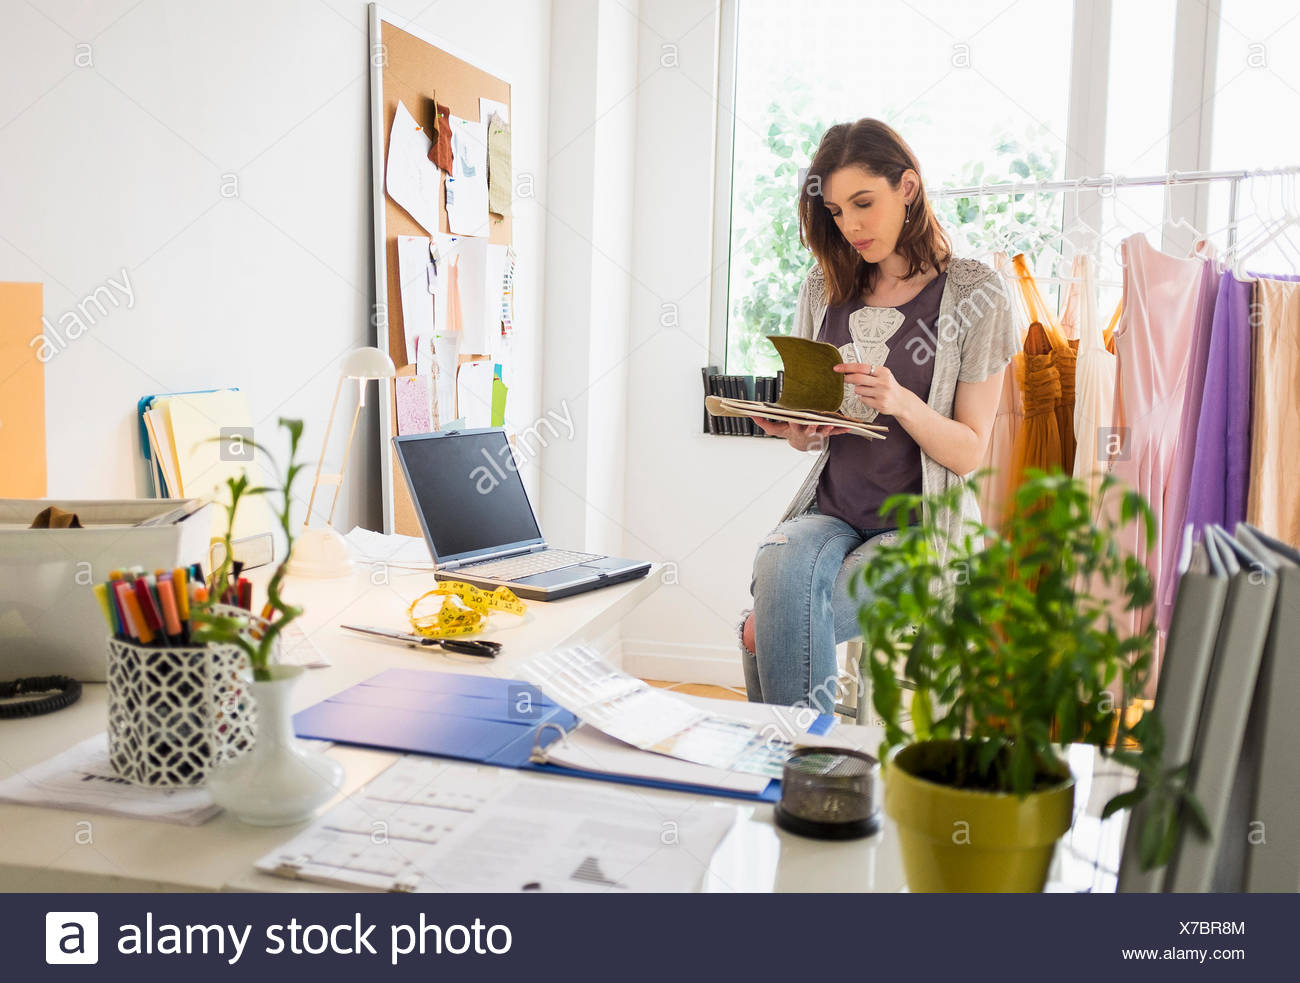 Female fashion designer in her office - Stock Image